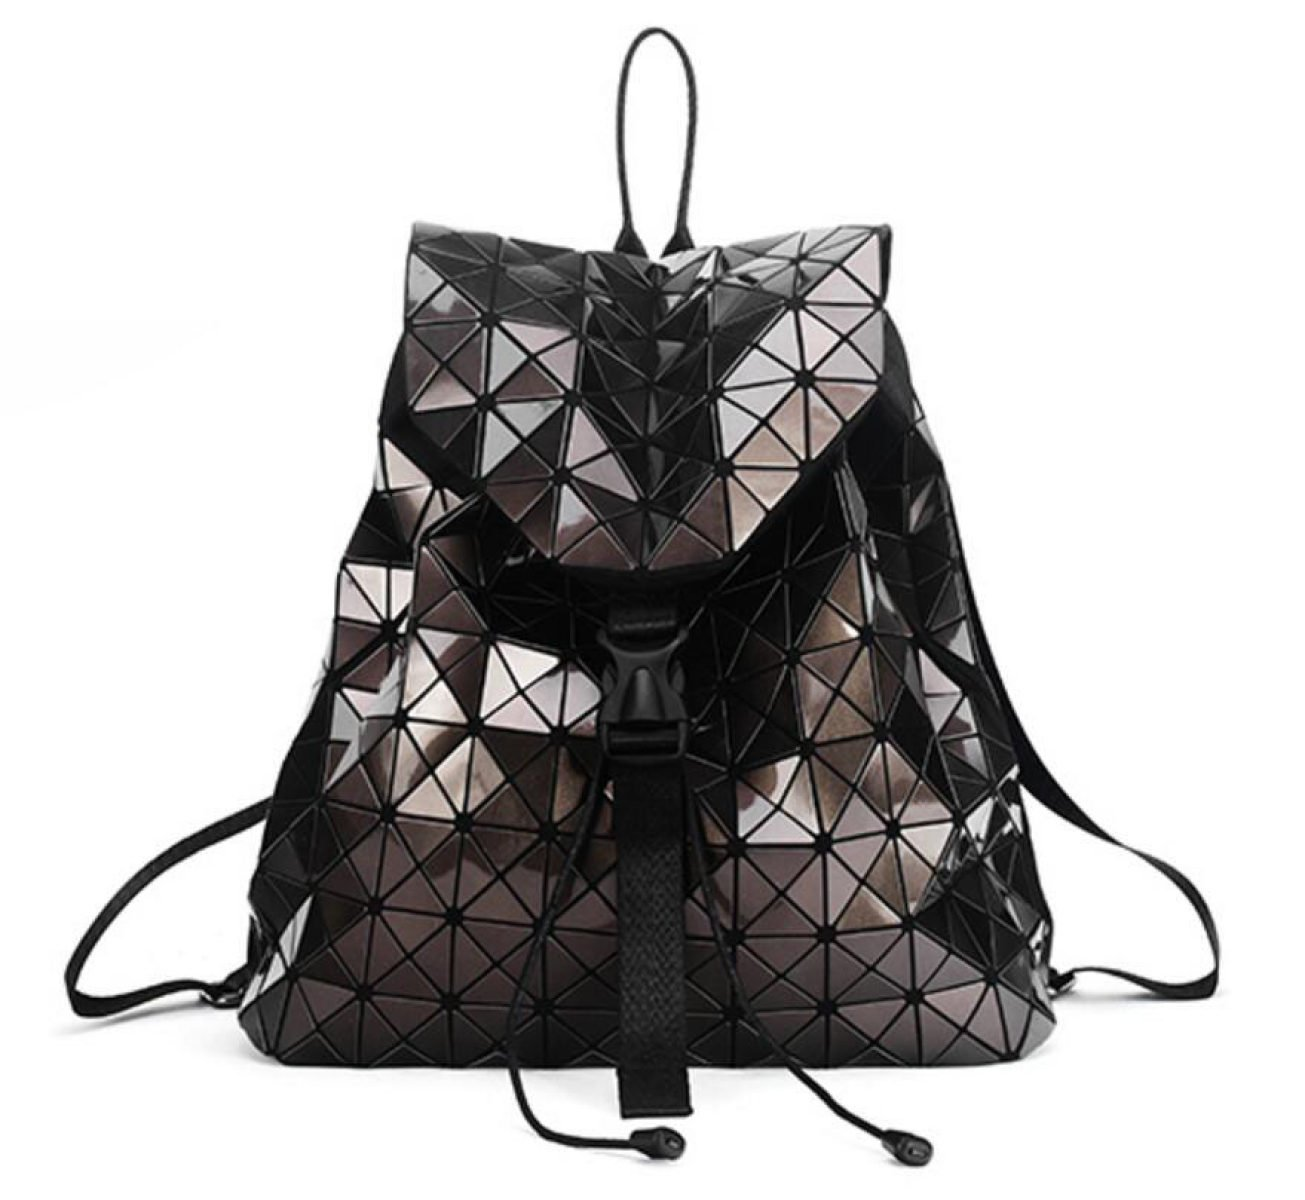 Brown Geometric Laser Ladies Backpack Travel Shoulder Bag Briefcase Backpack,Black